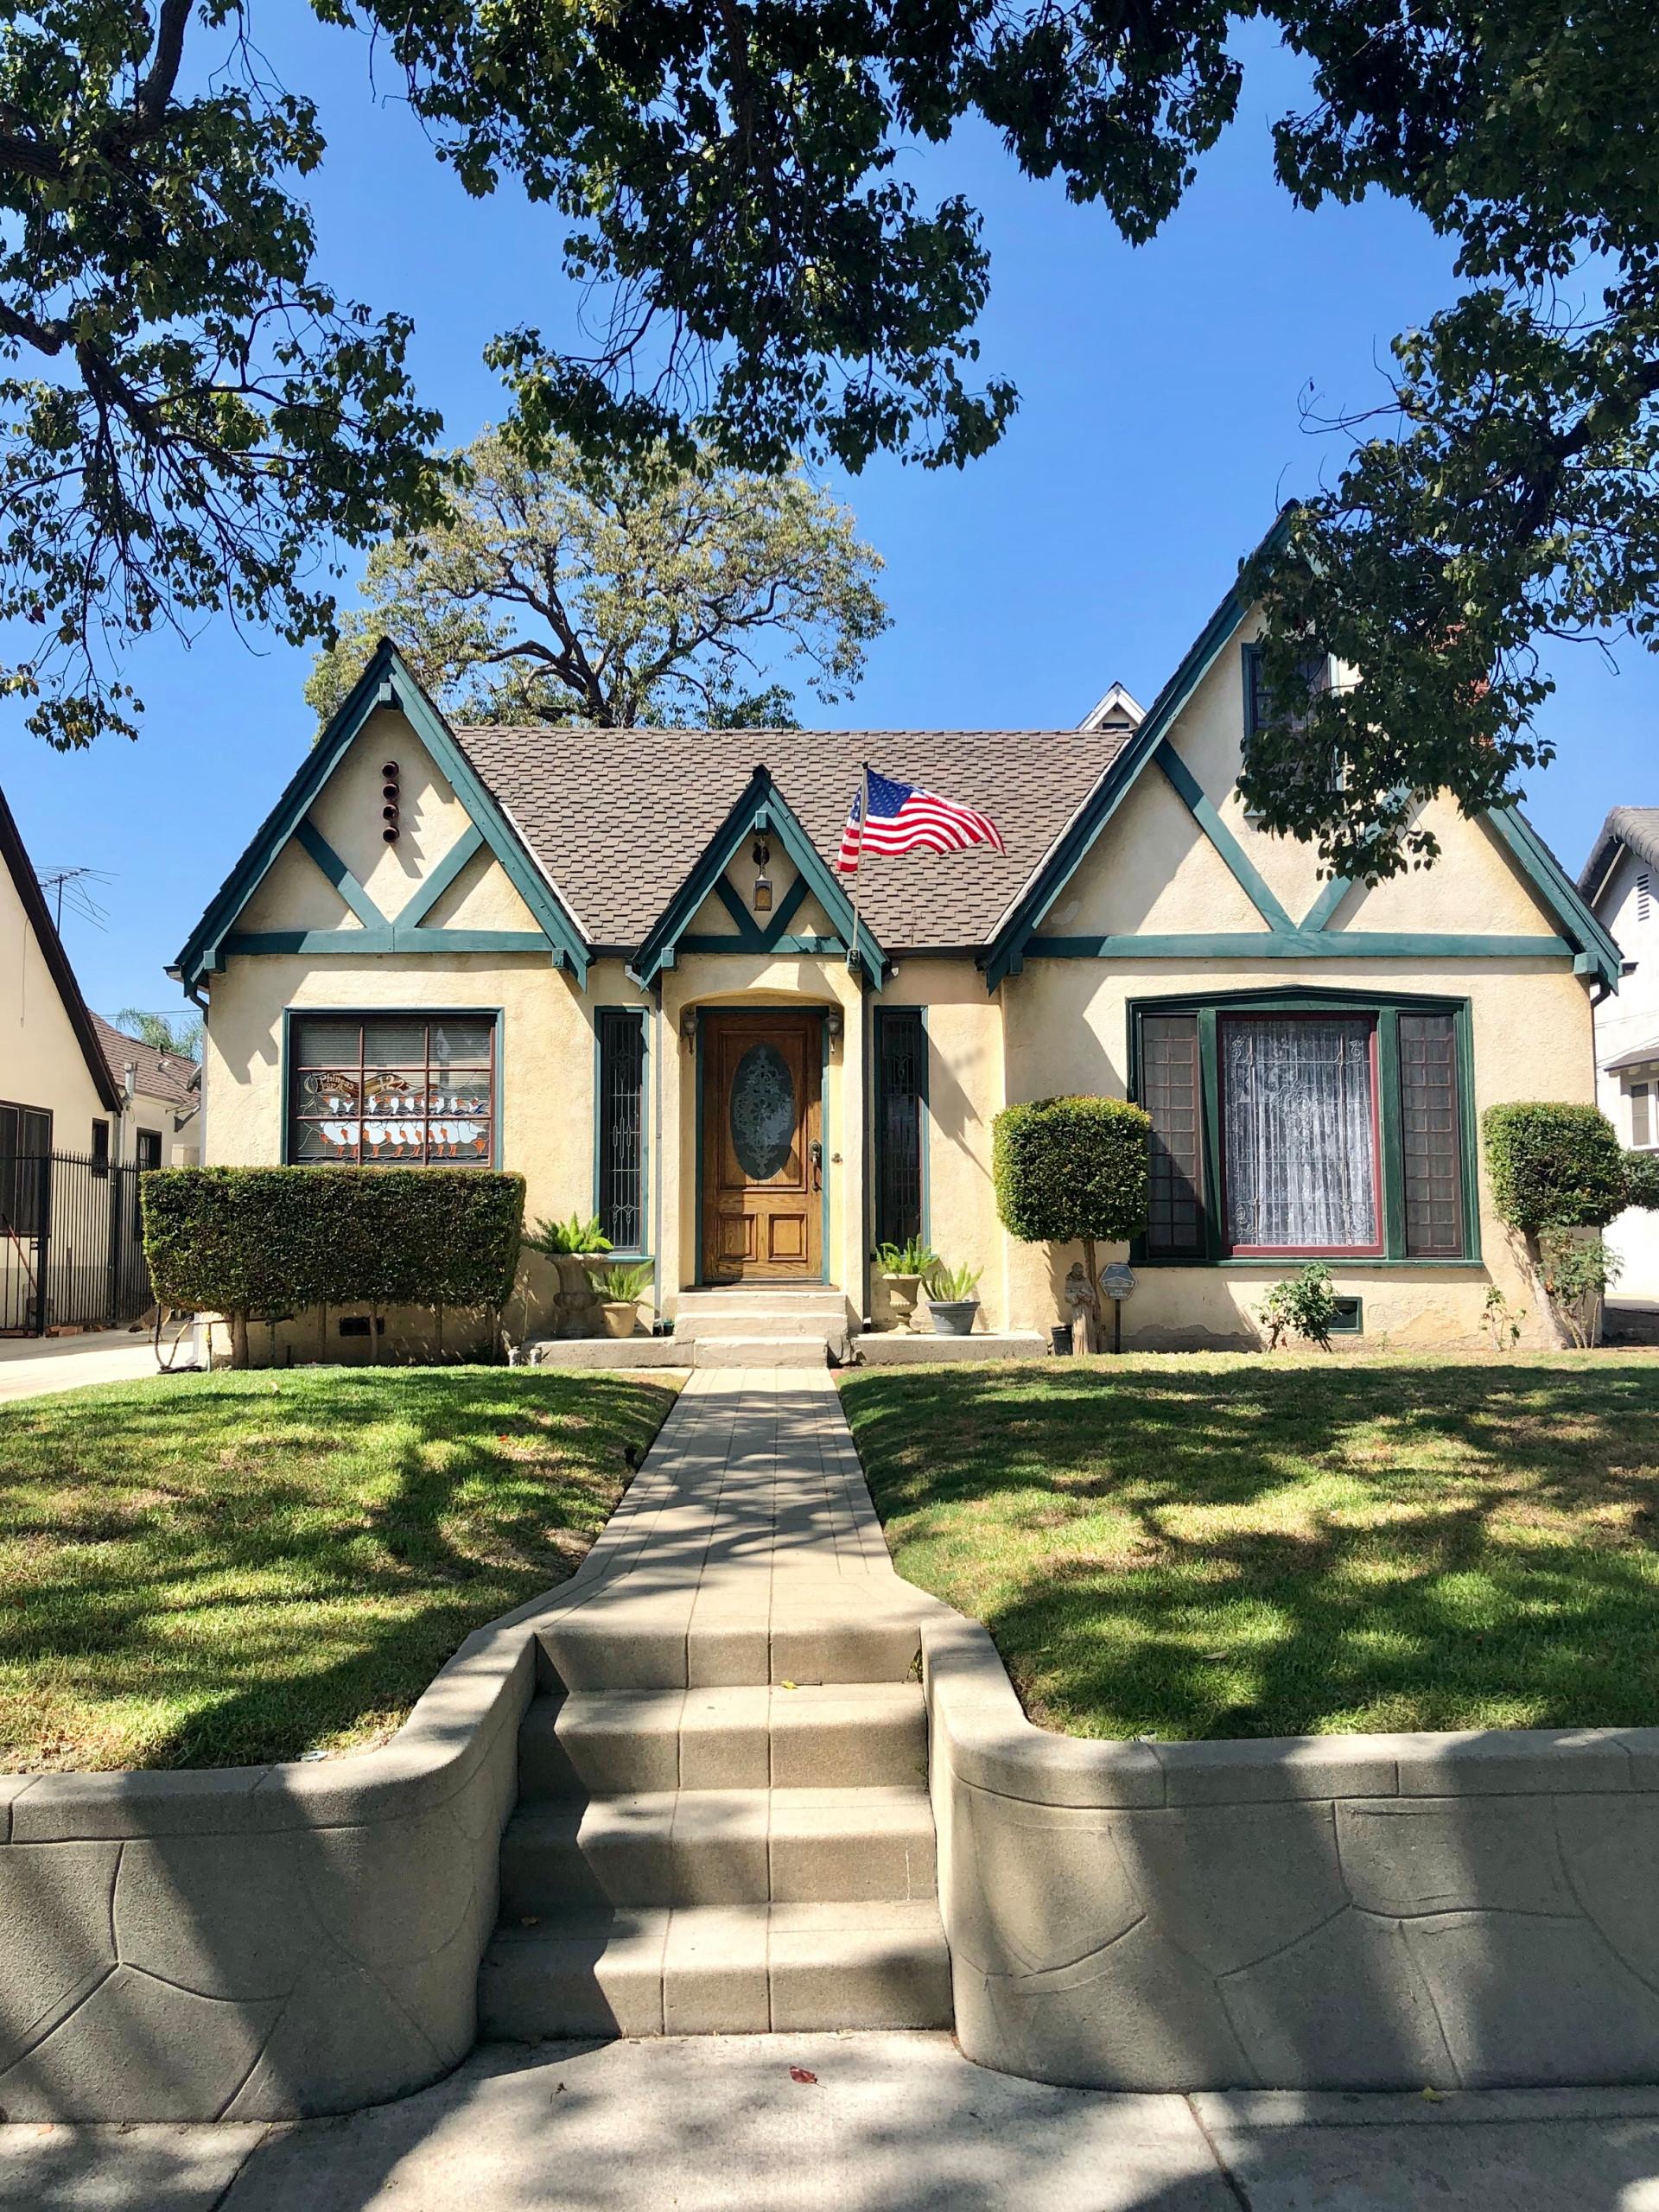 Tudor House in Wilmington, CA